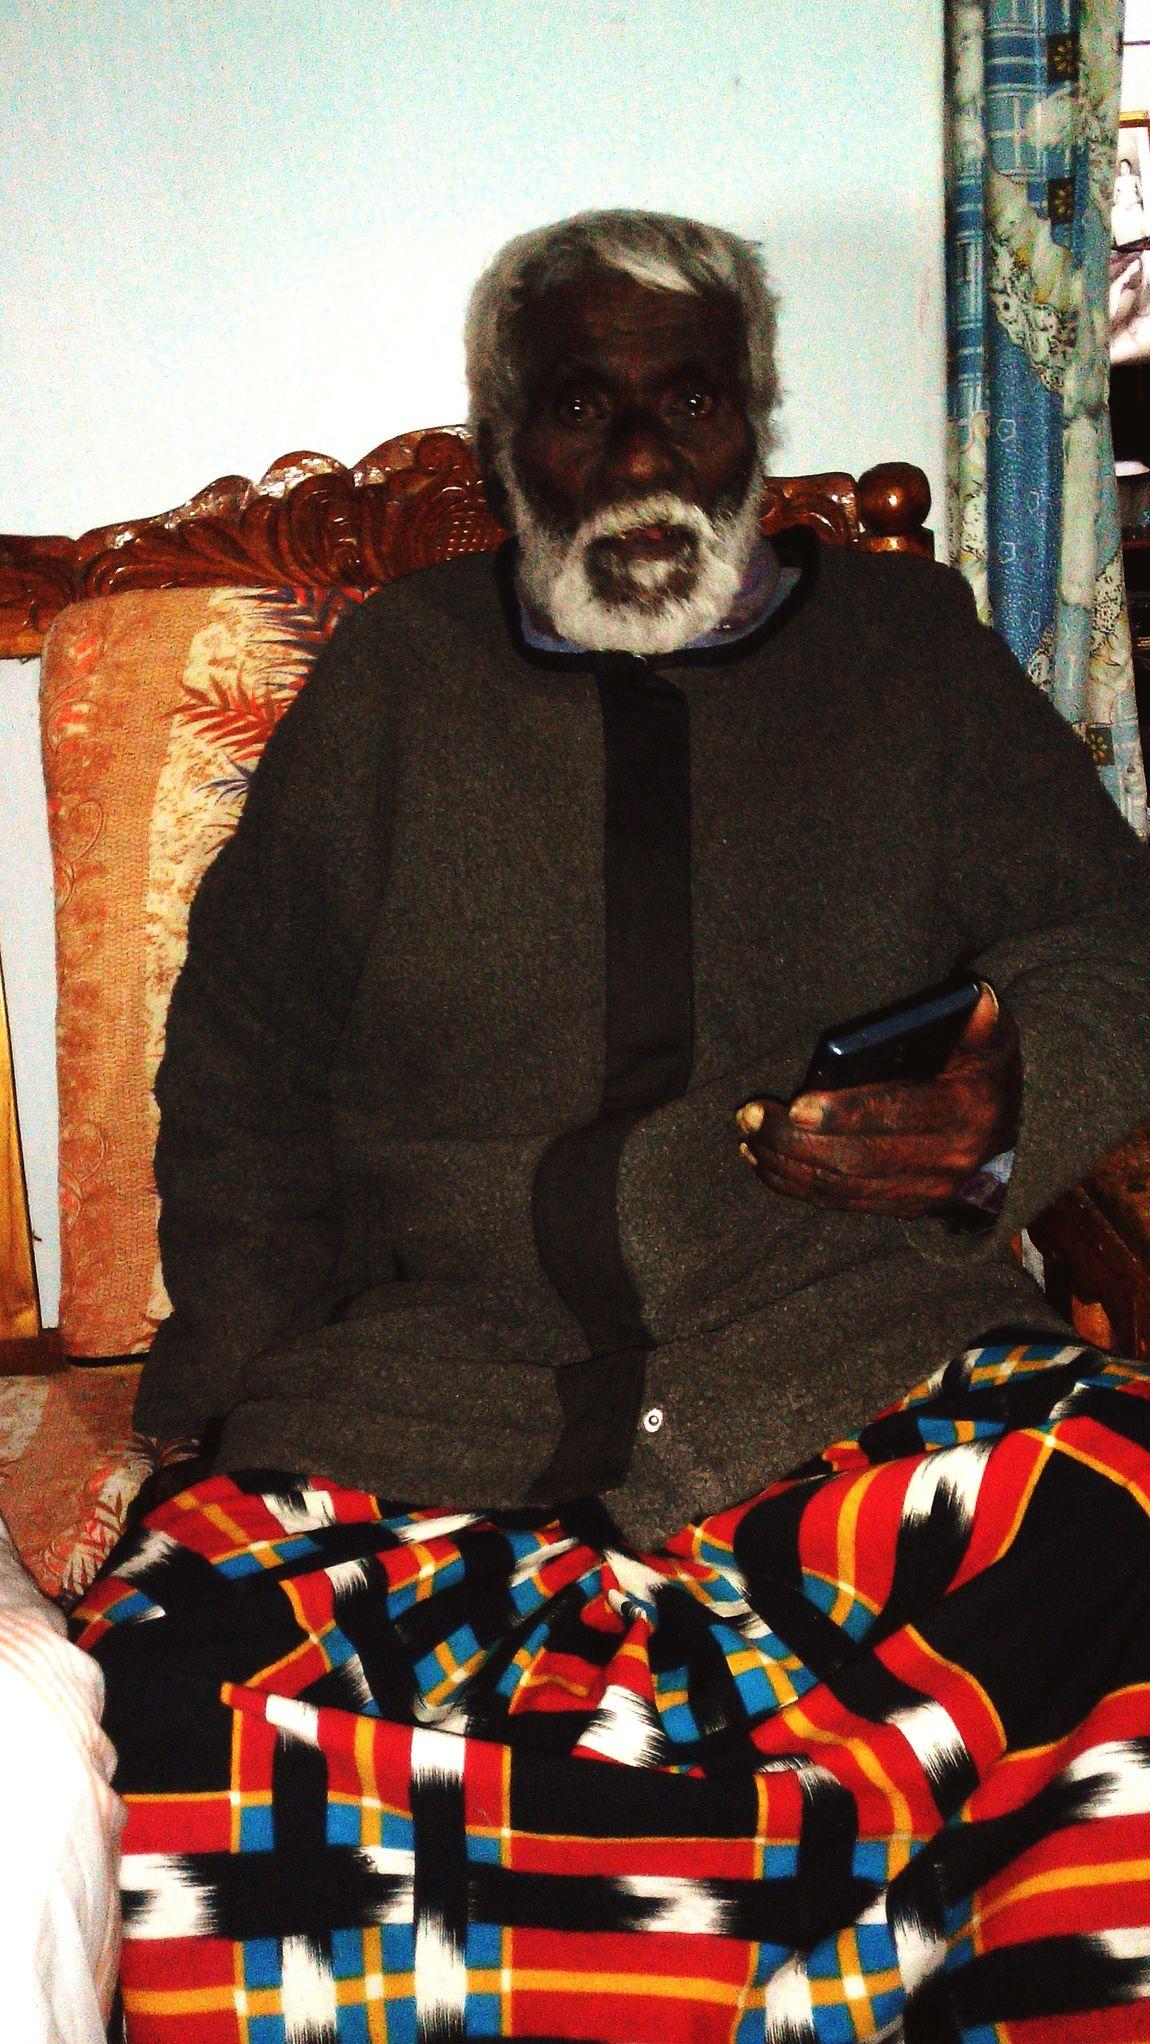 One Of Eldest Son Eldest Brother Eldest Uncle Eldest Grandfather Funnest & Good Heart Man Met In My Life Time